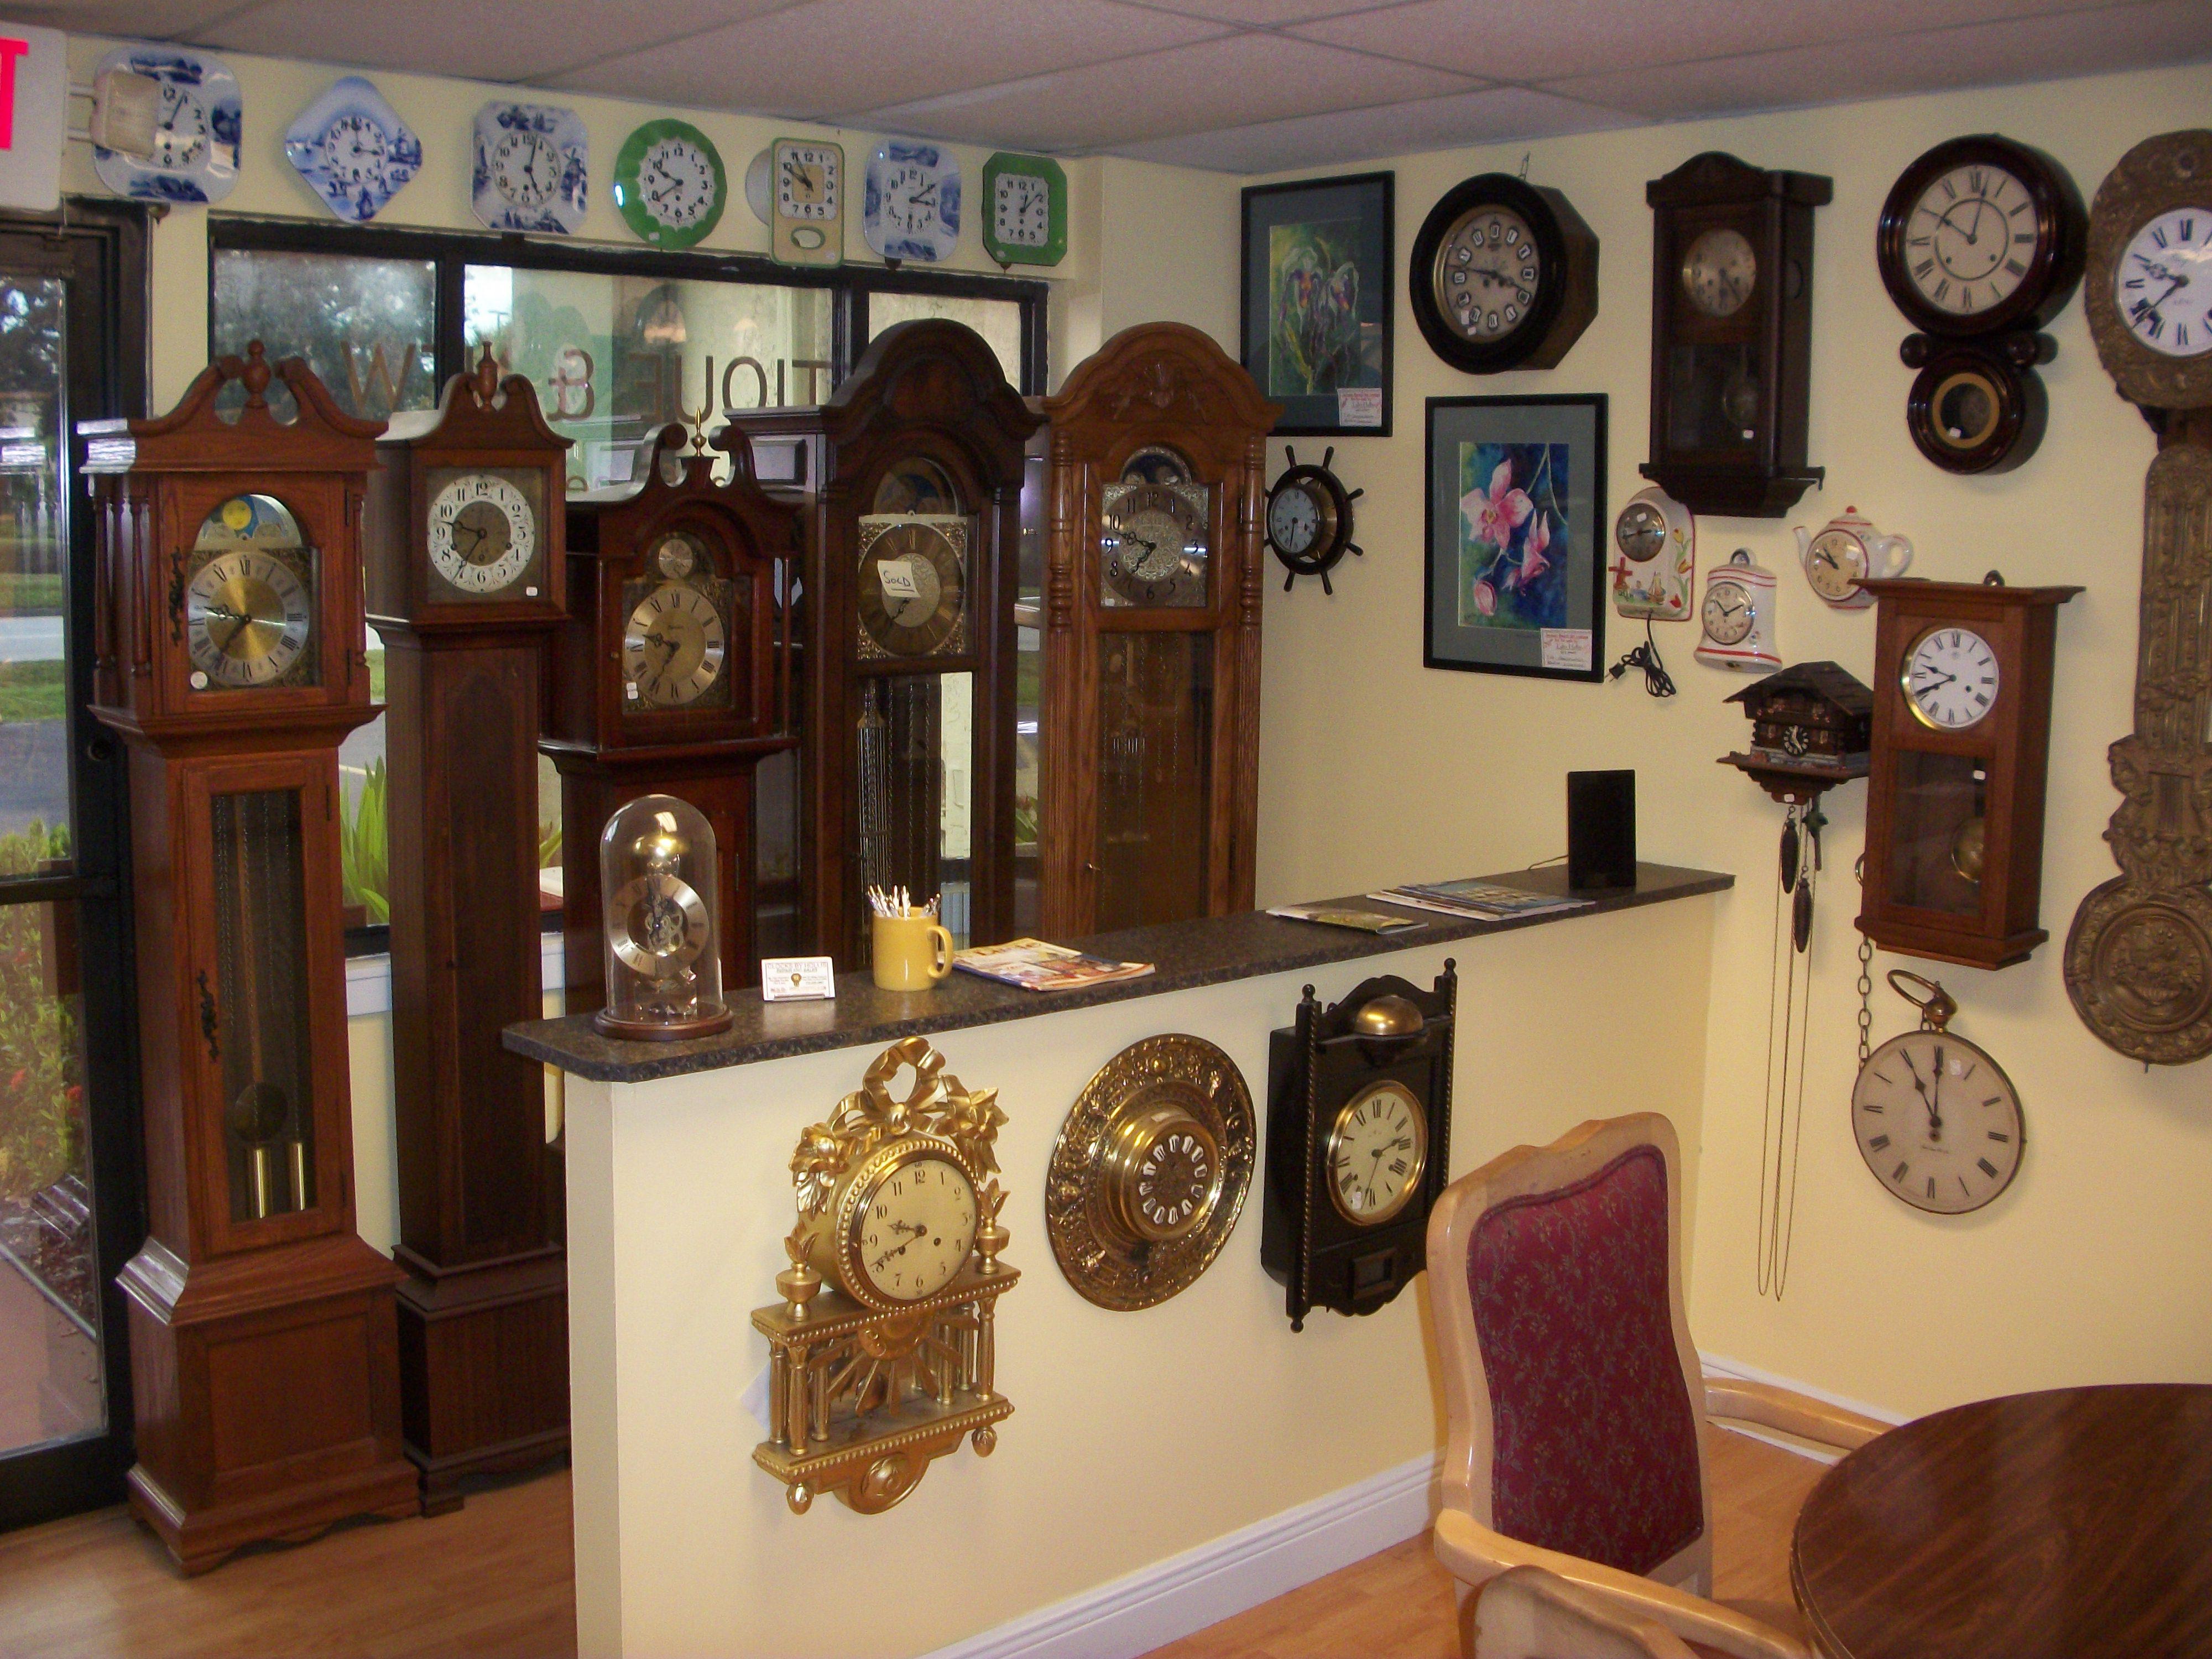 Clocks By Hollis 1445 SE Village Green Dr, Port Saint Lucie, FL 34952    YP.com